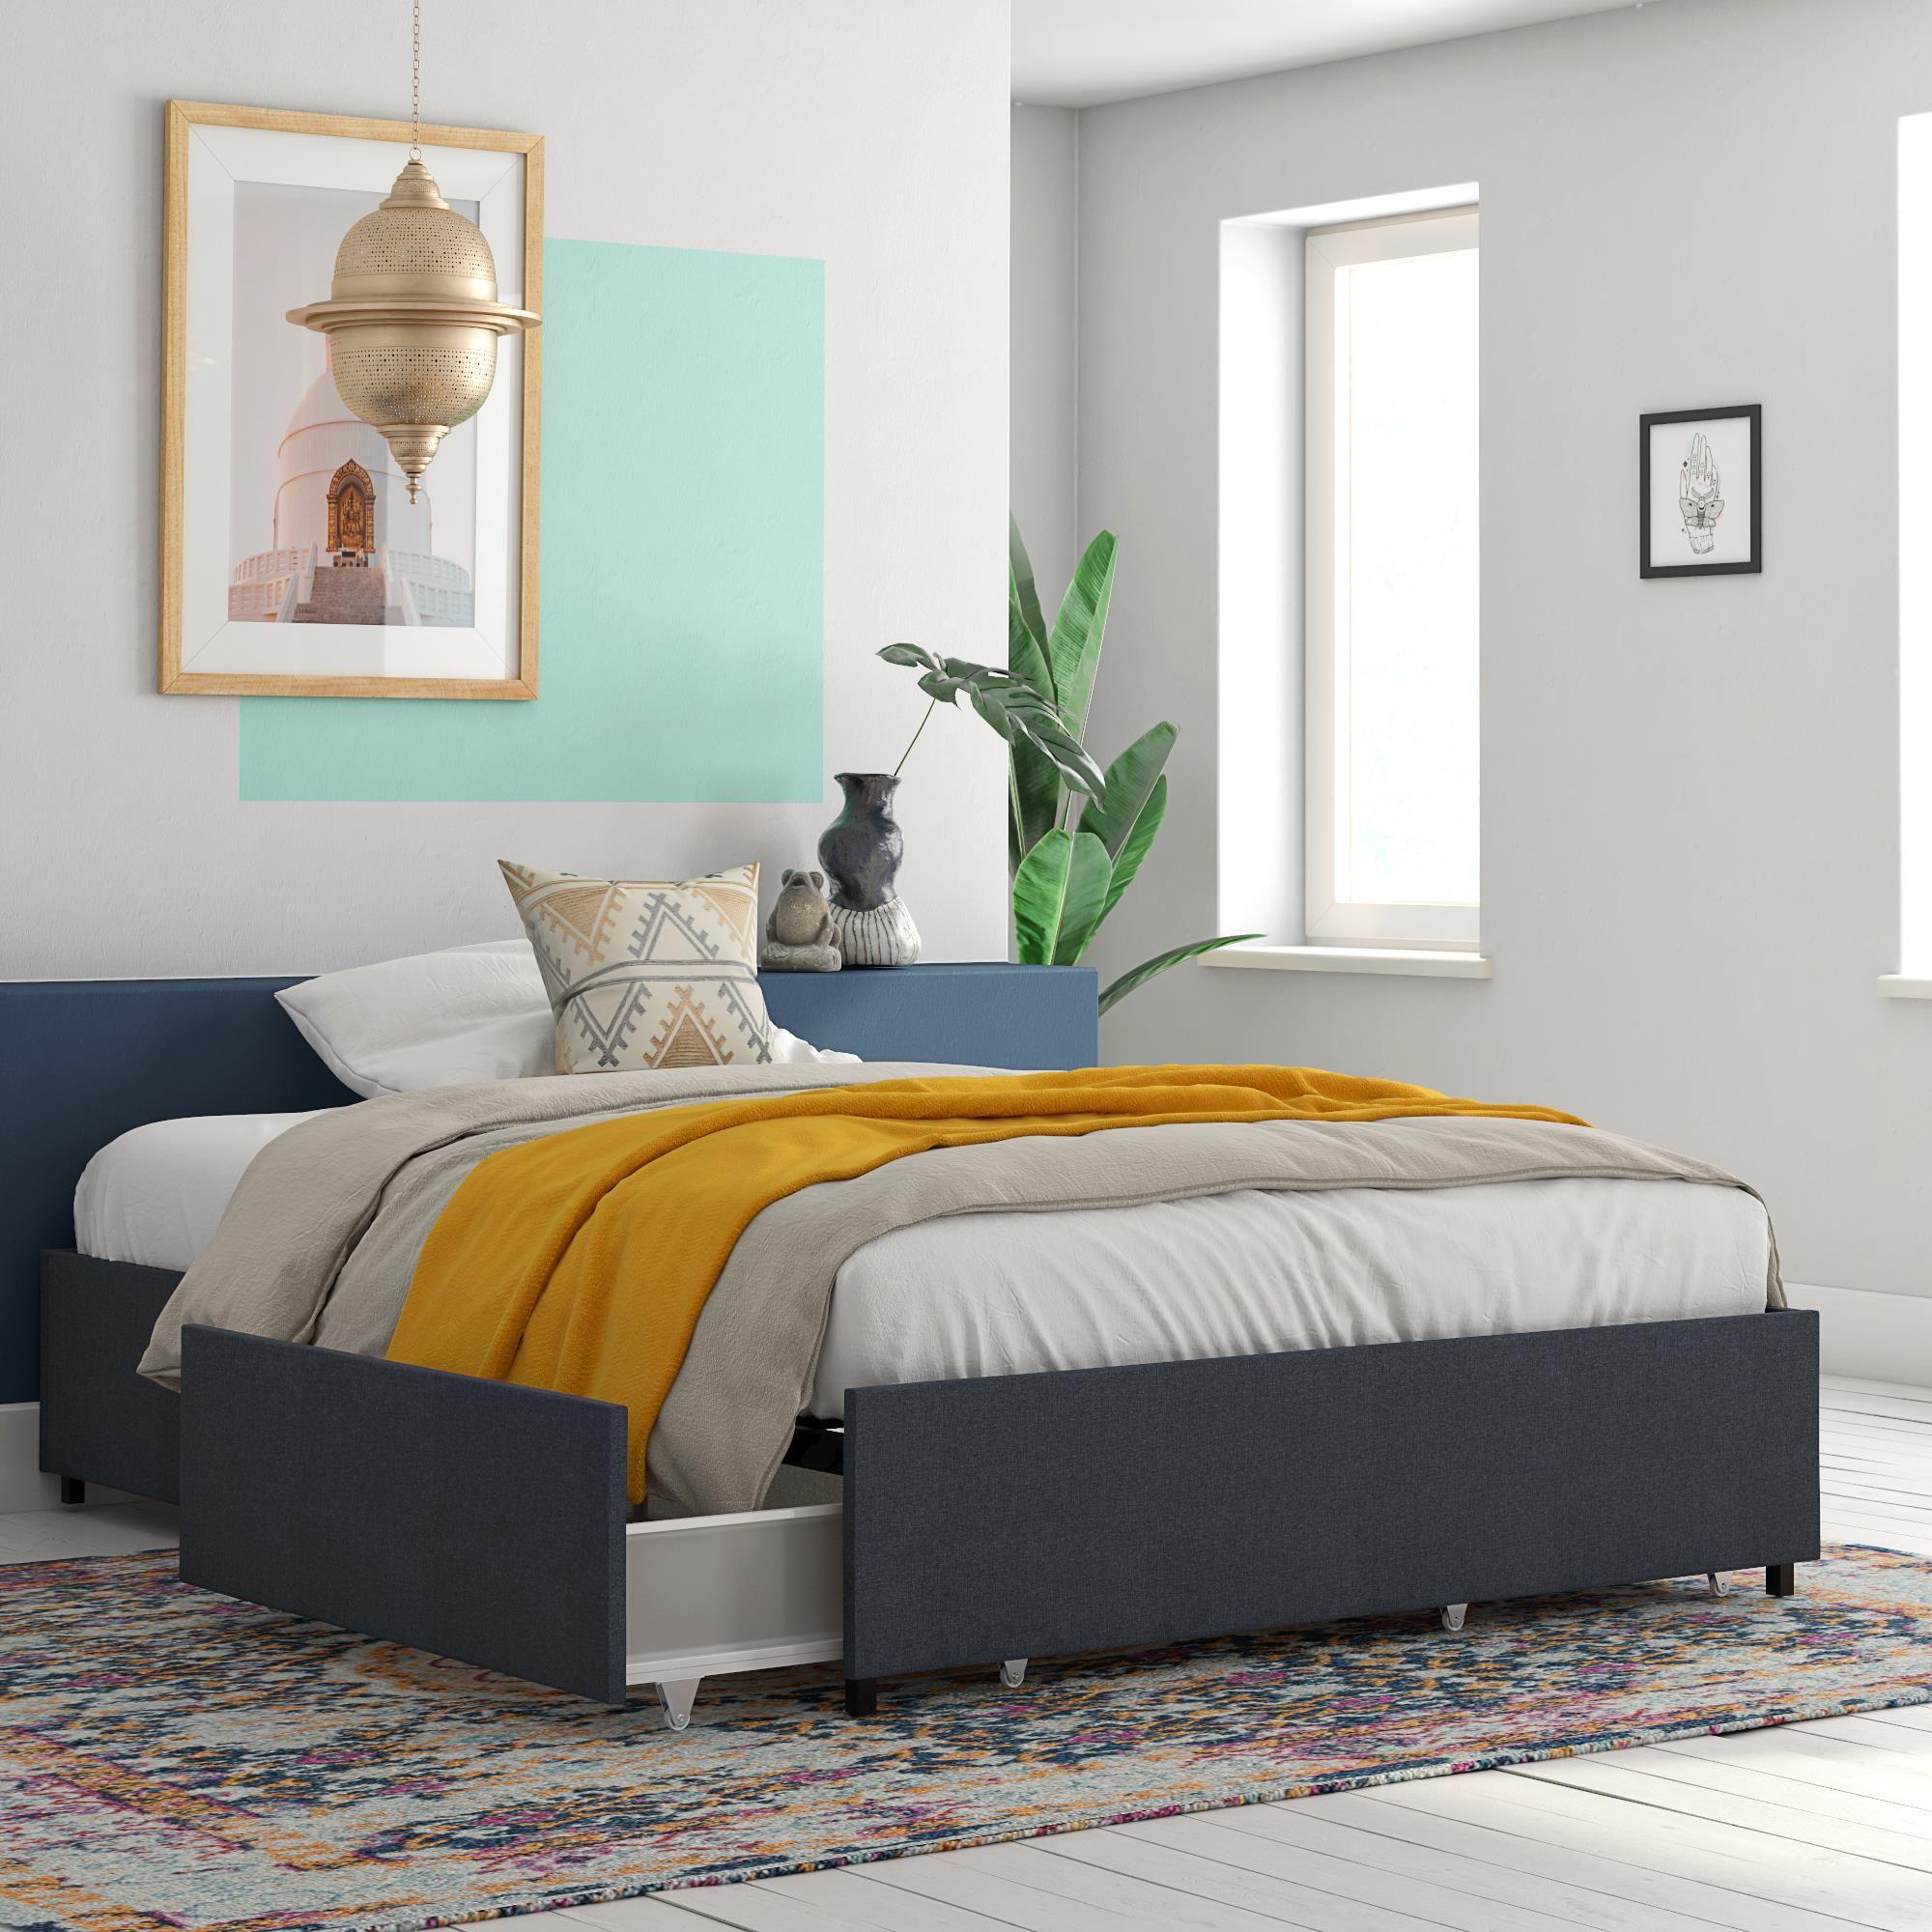 Home Platform Bed With Storage Bed Storage Drawers Storage Bed